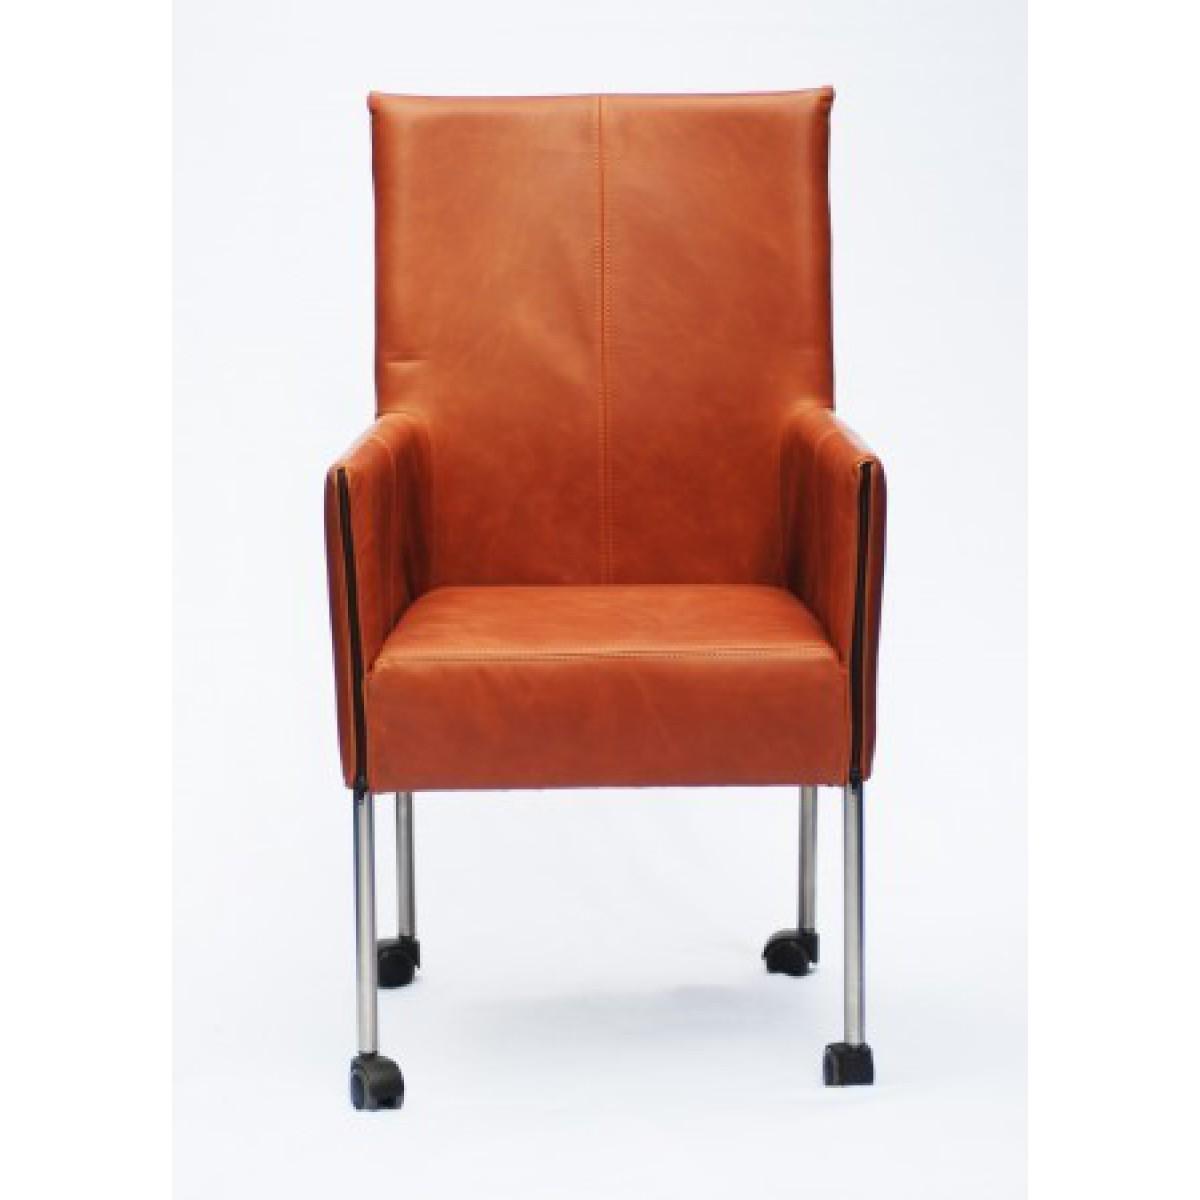 viton-eetkamerstoel-op-wielen-he-design-leder-voorkant